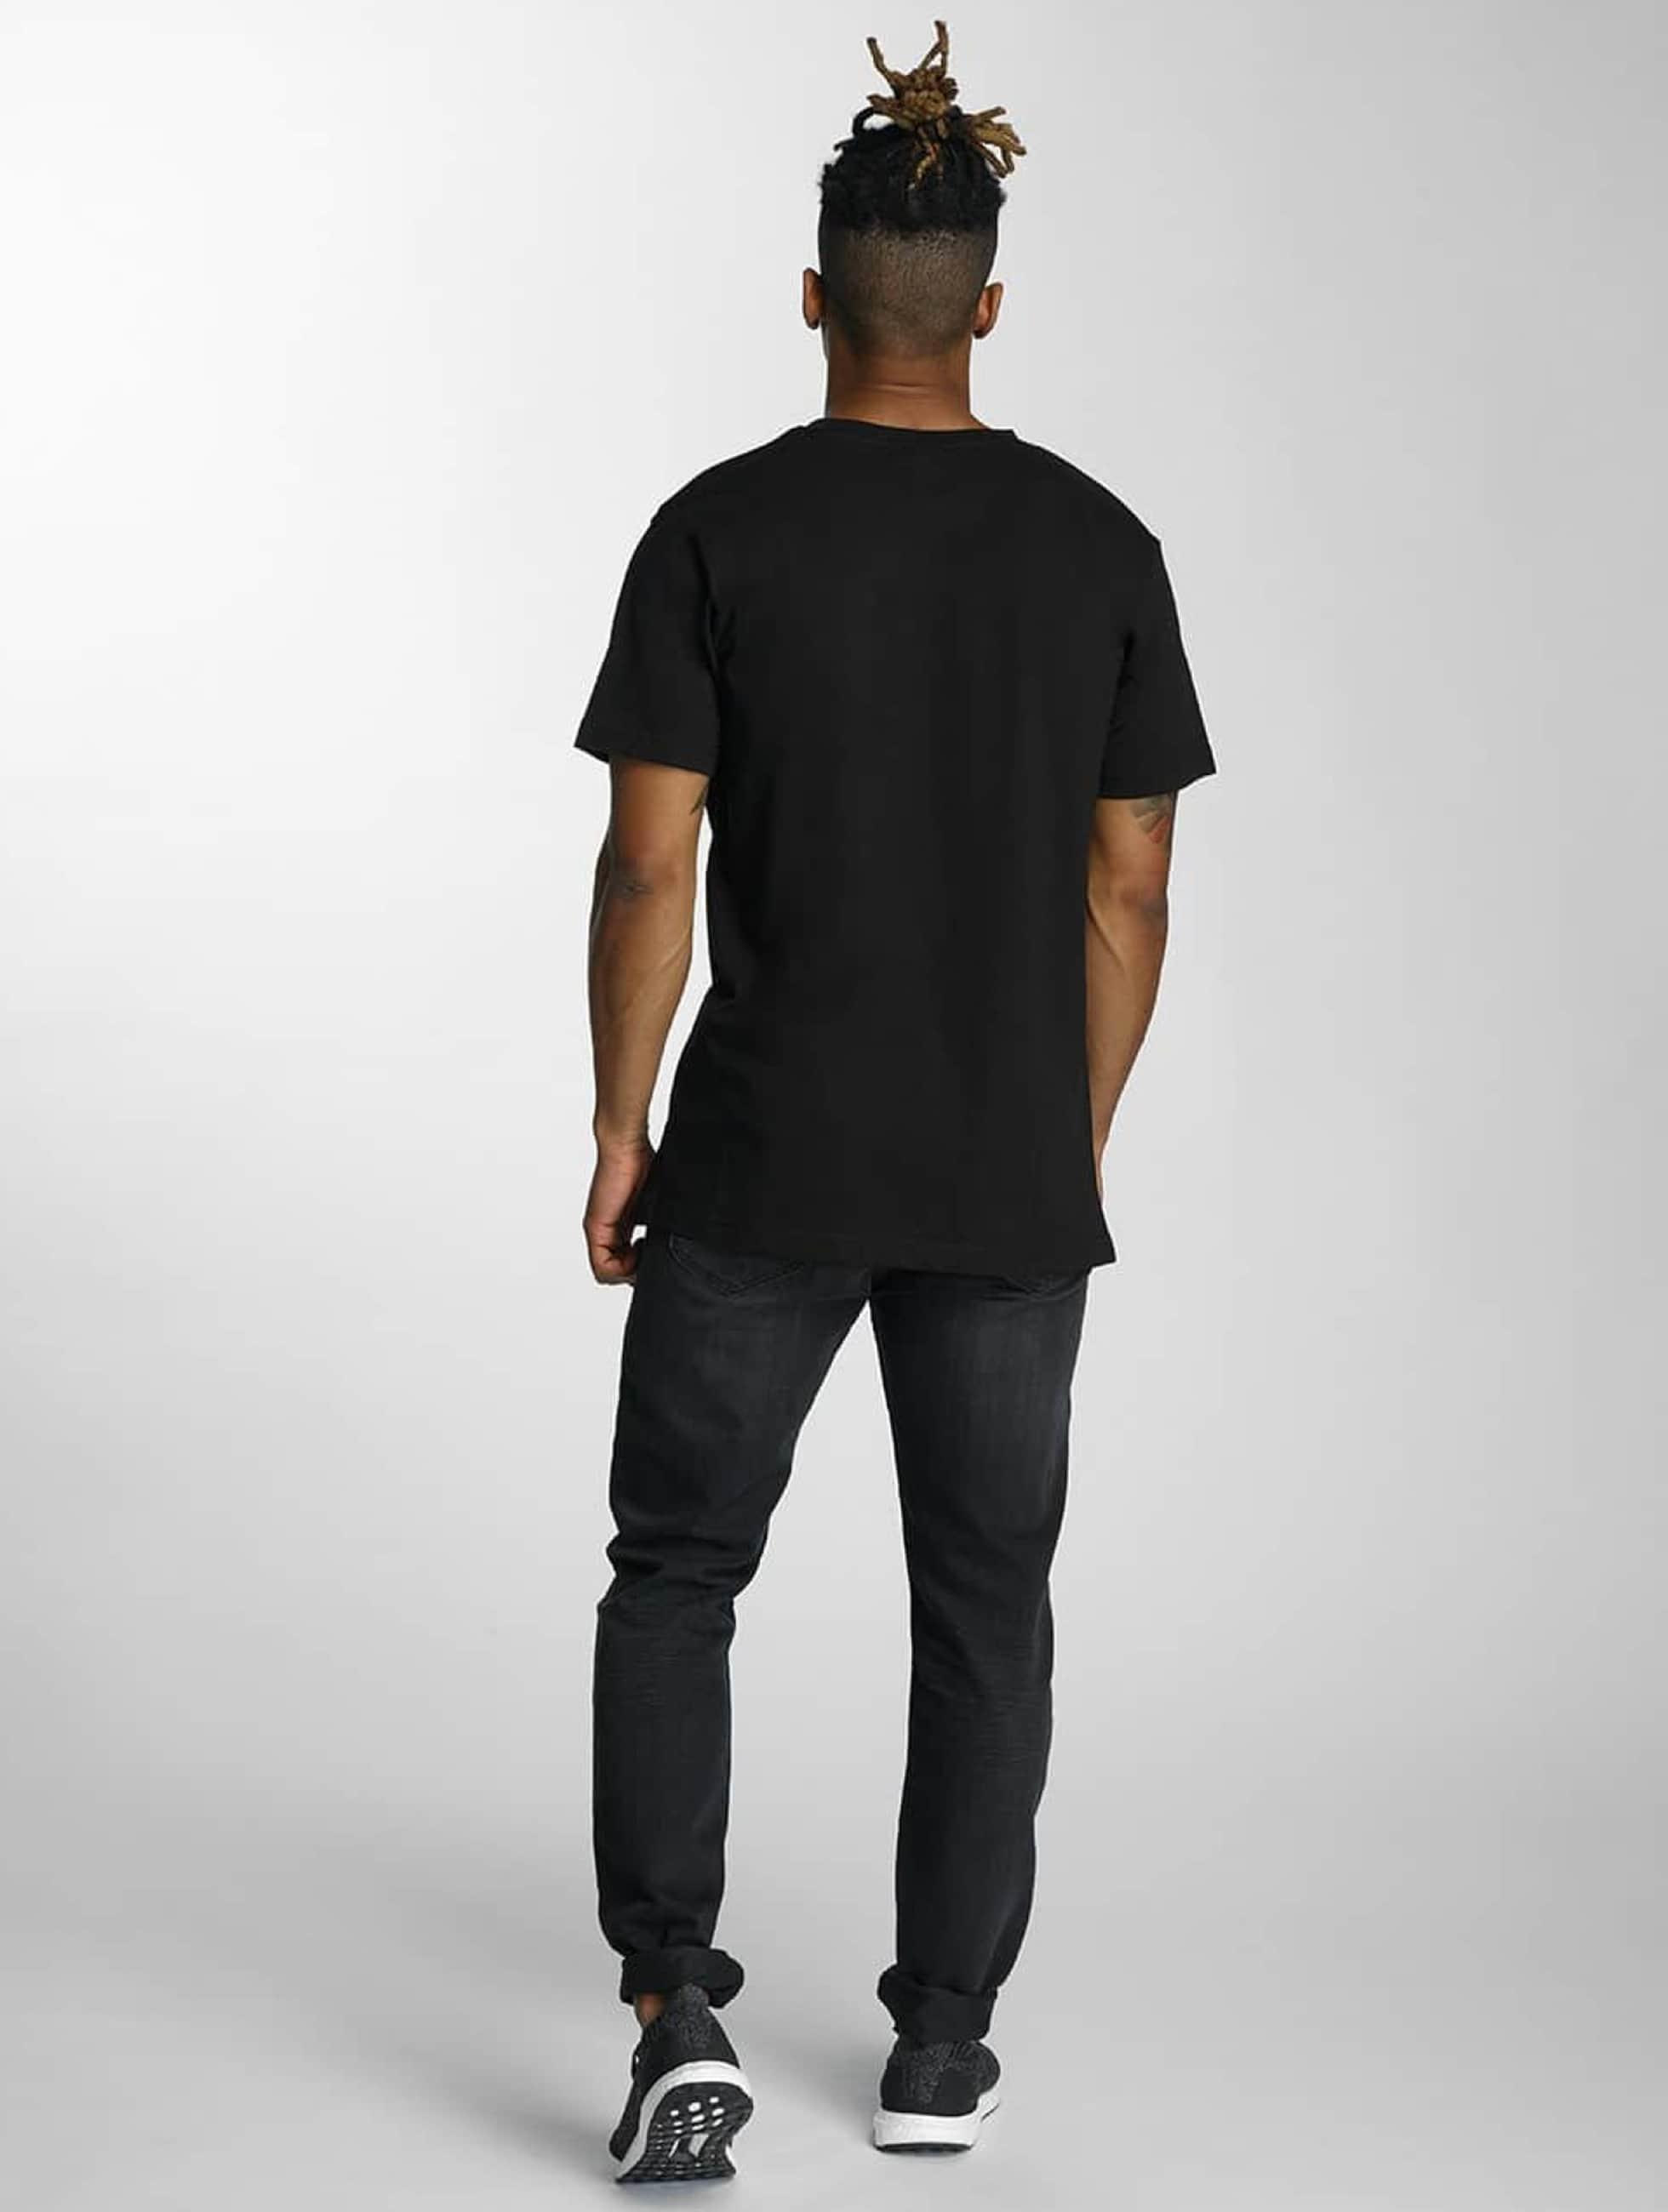 Mister Tee T-Shirt 99 Problems black